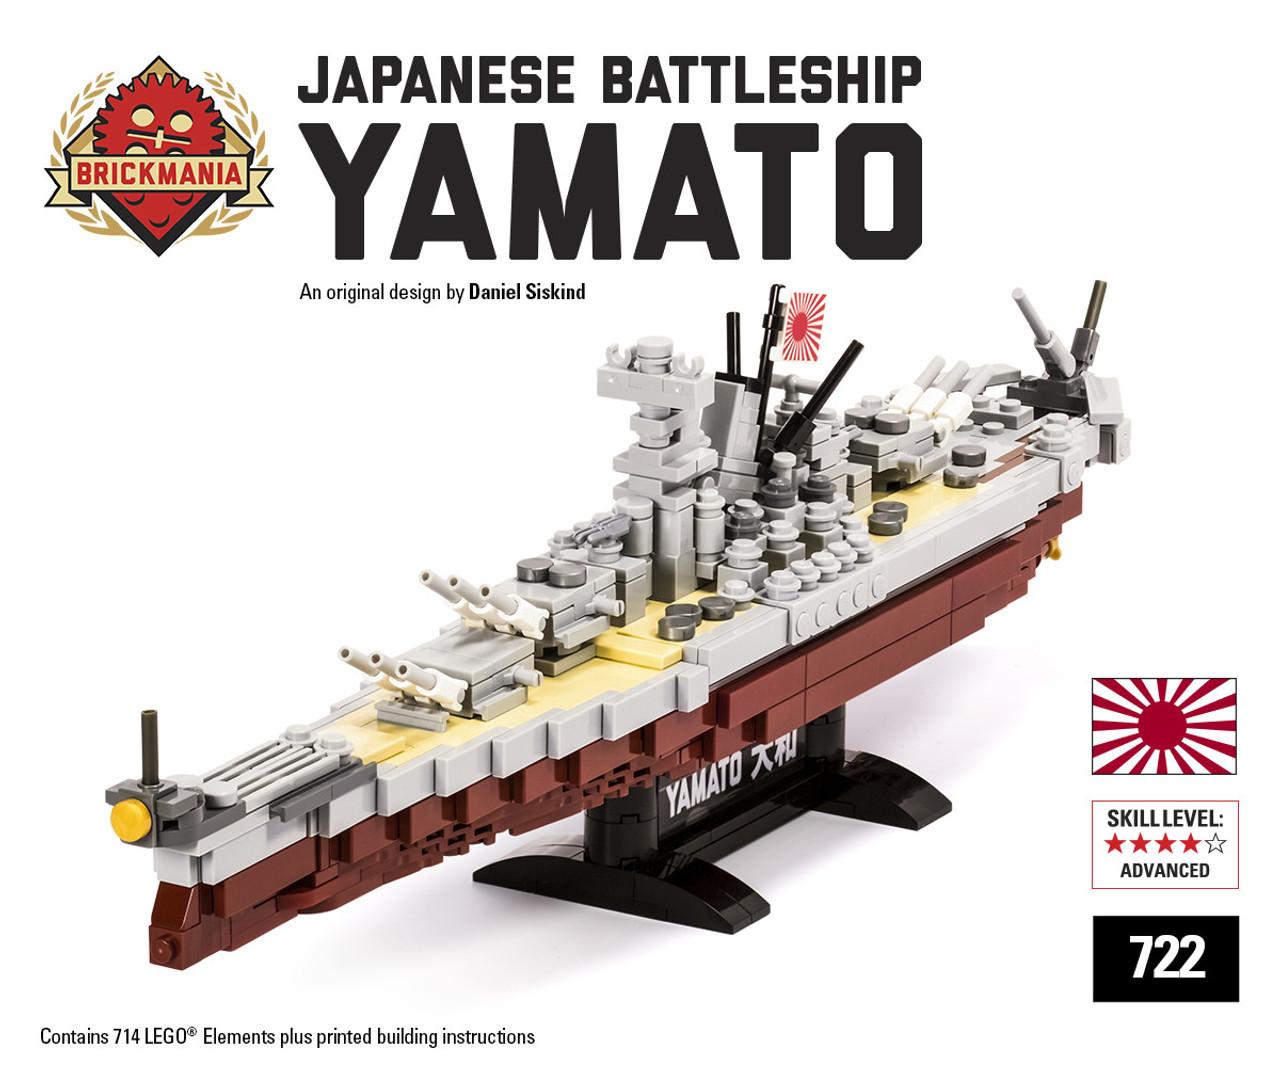 Battleship Yamato Brickmania Toys